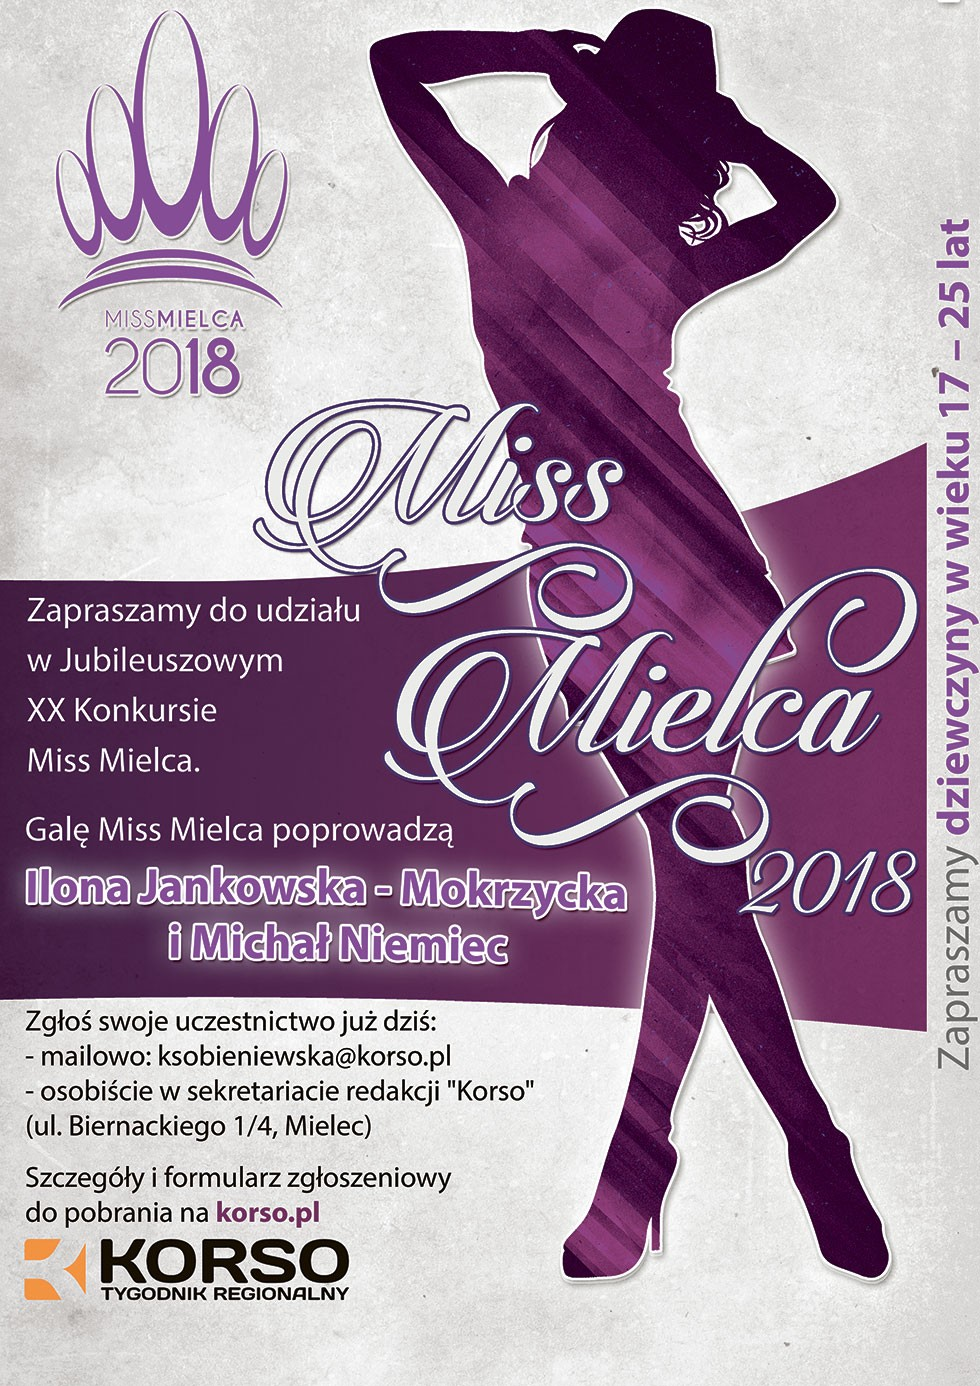 miss mielca 2018